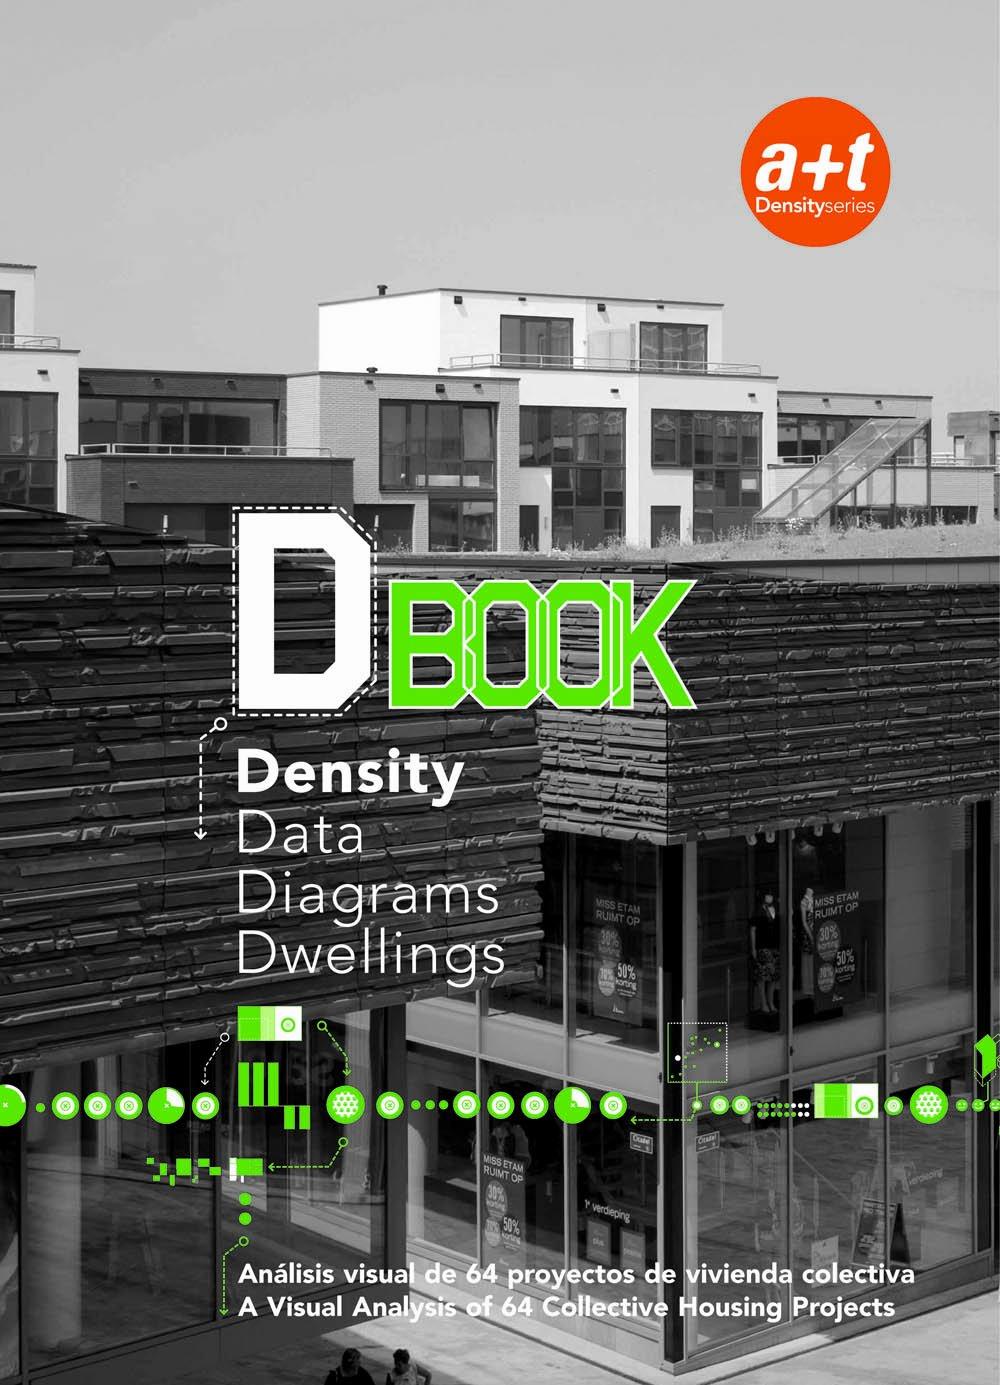 DBOOK. DENSITY DATA DIAGRAMS DWELLINGS: Amazon.es: Javier Mozas, Javier Arpa Aurora Fernández Per: Libros